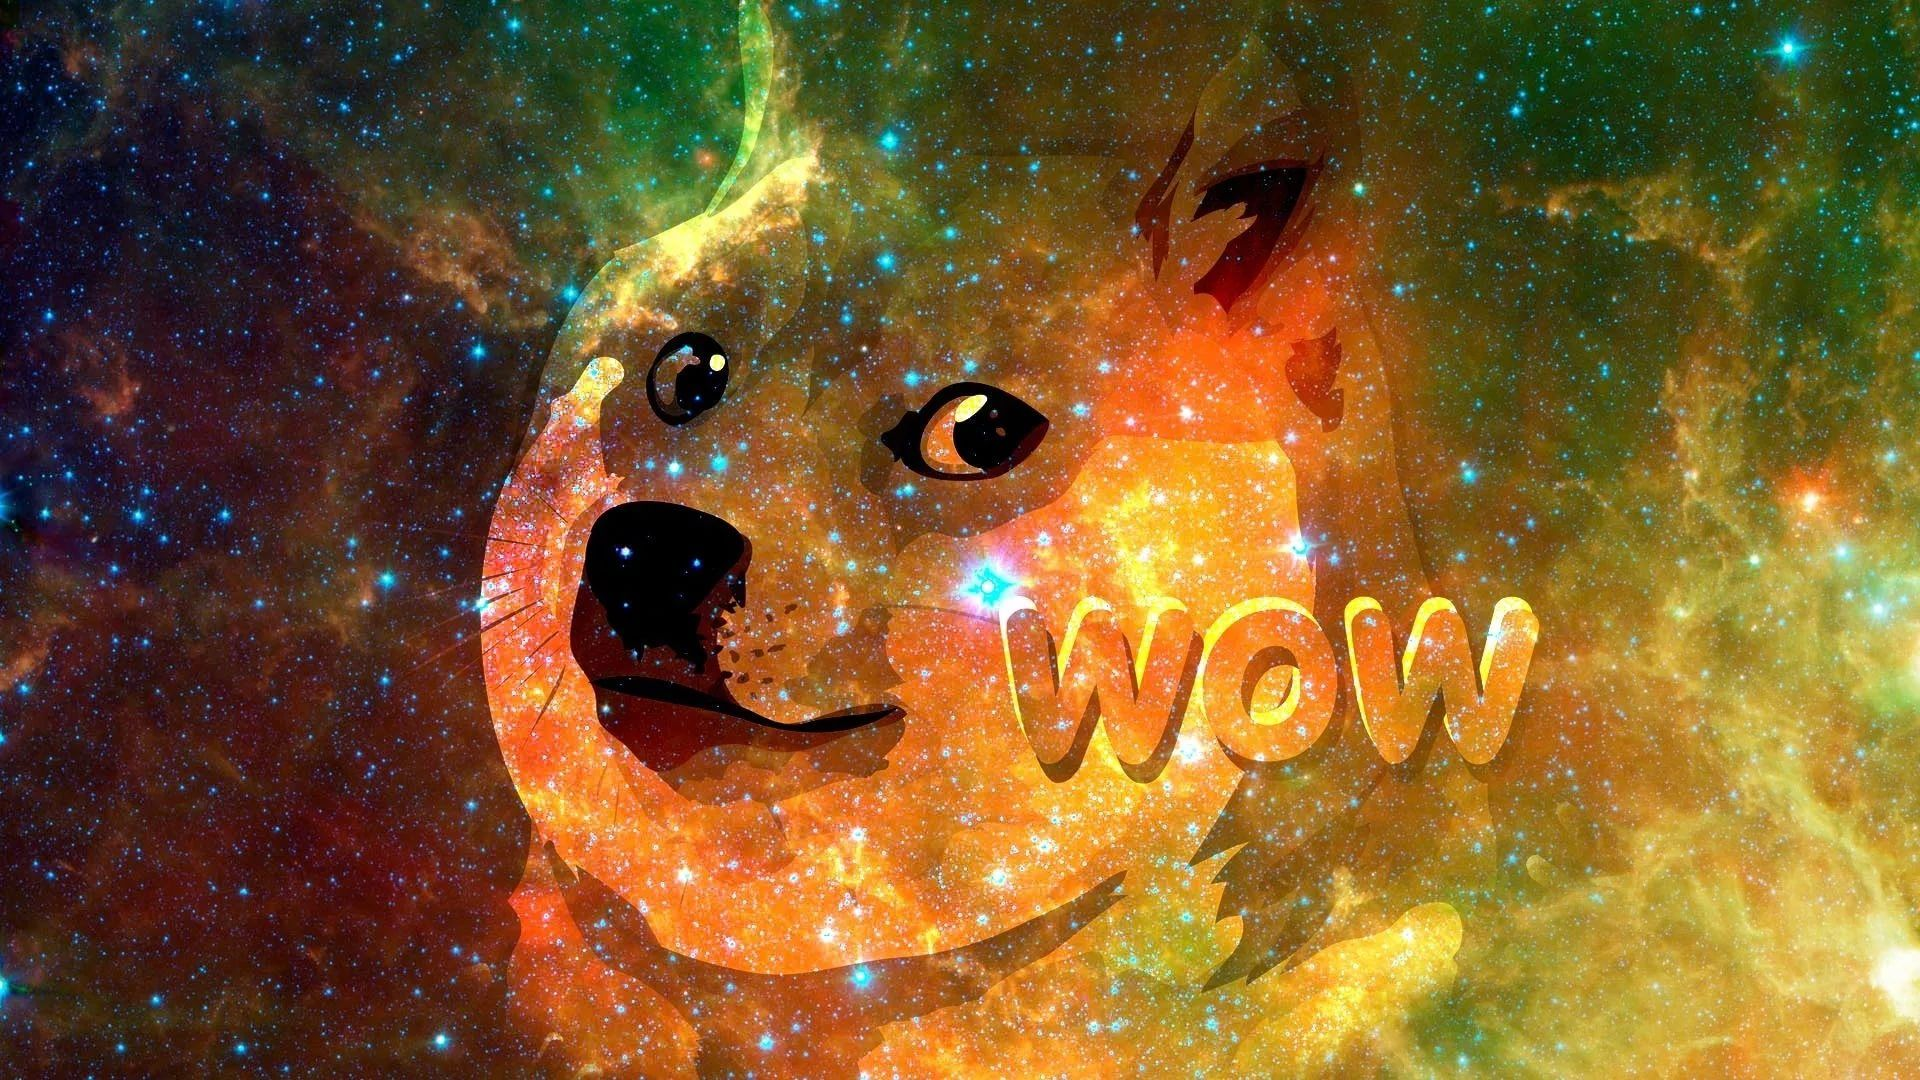 Meme desktop wallpaper